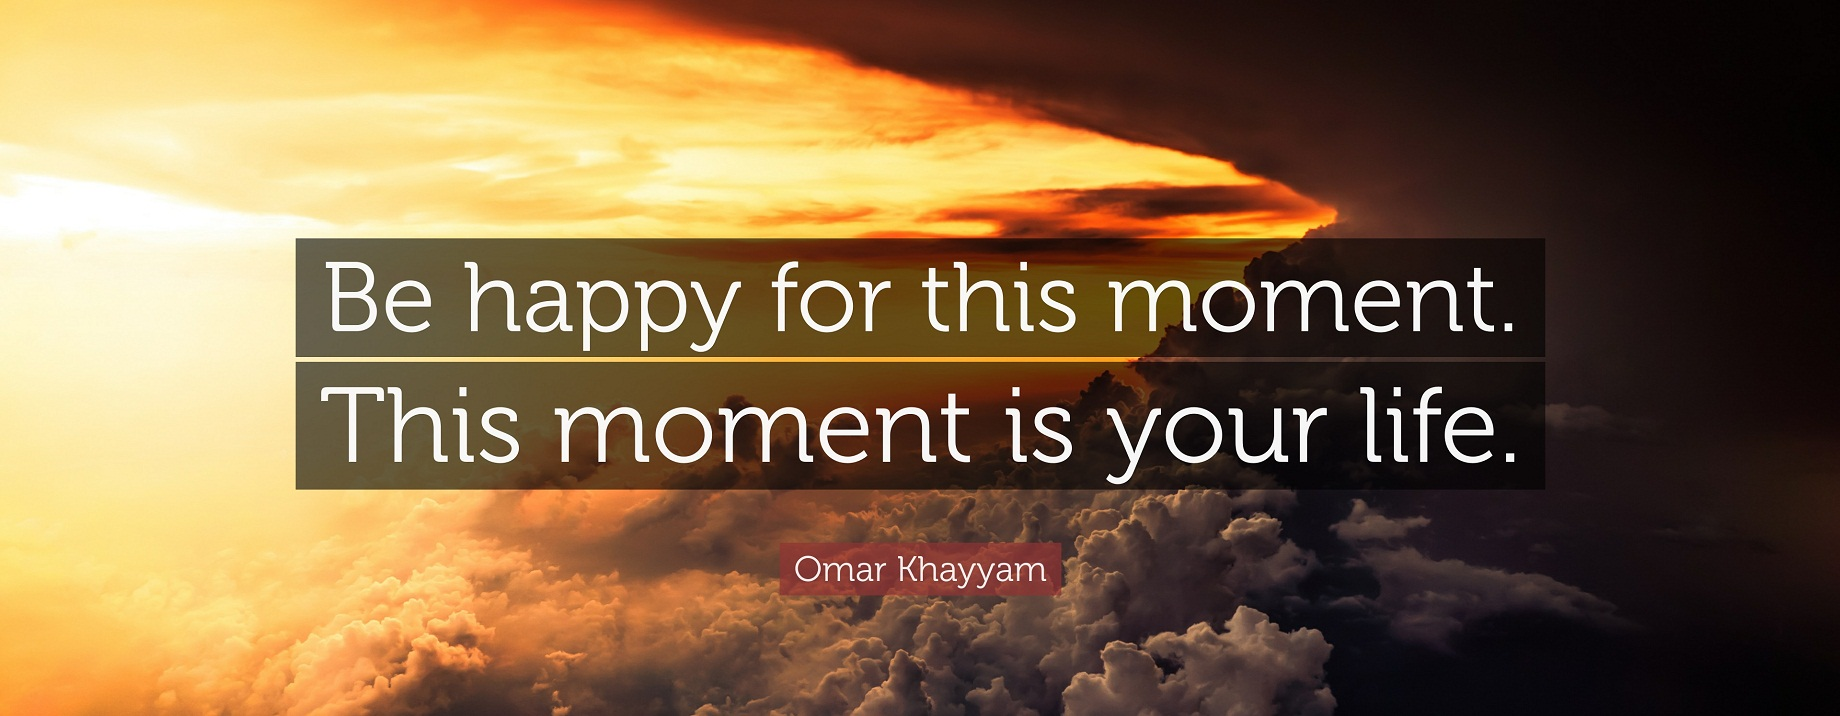 This Moment By Omar Khayyam